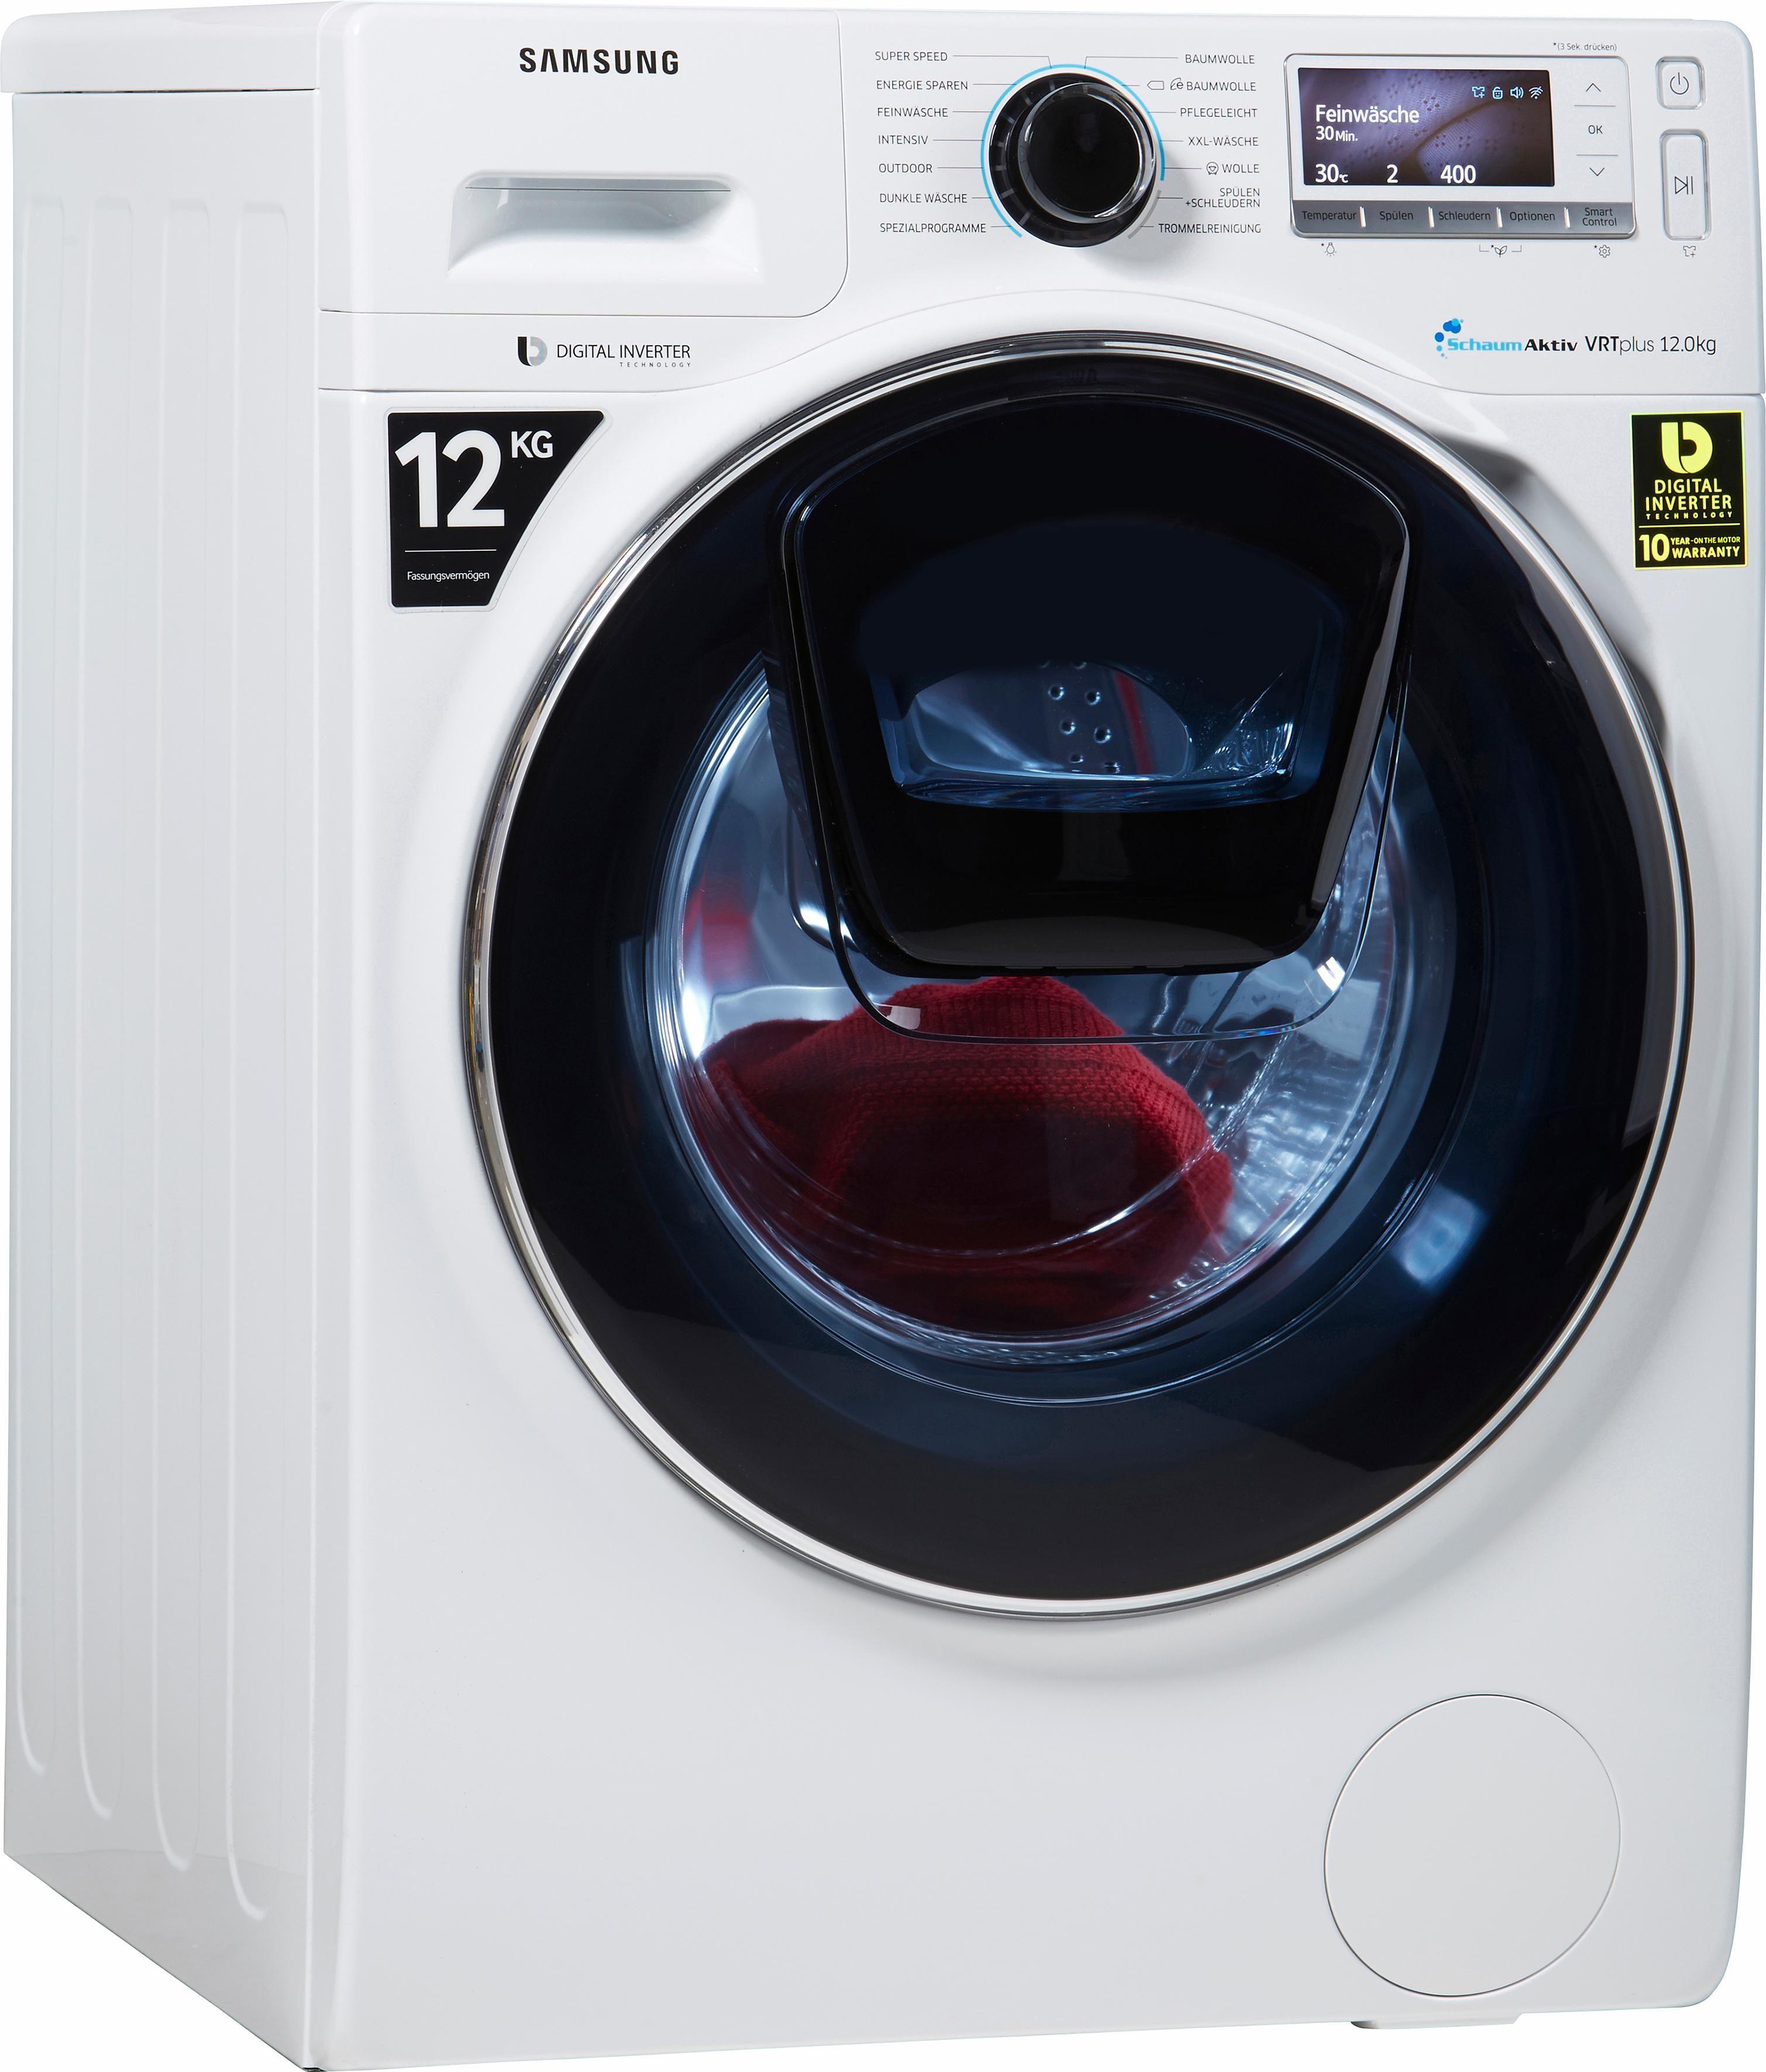 Samsung Waschmaschine WW12K8402OW/EG, A+++, 12 kg, 1400 U/Min